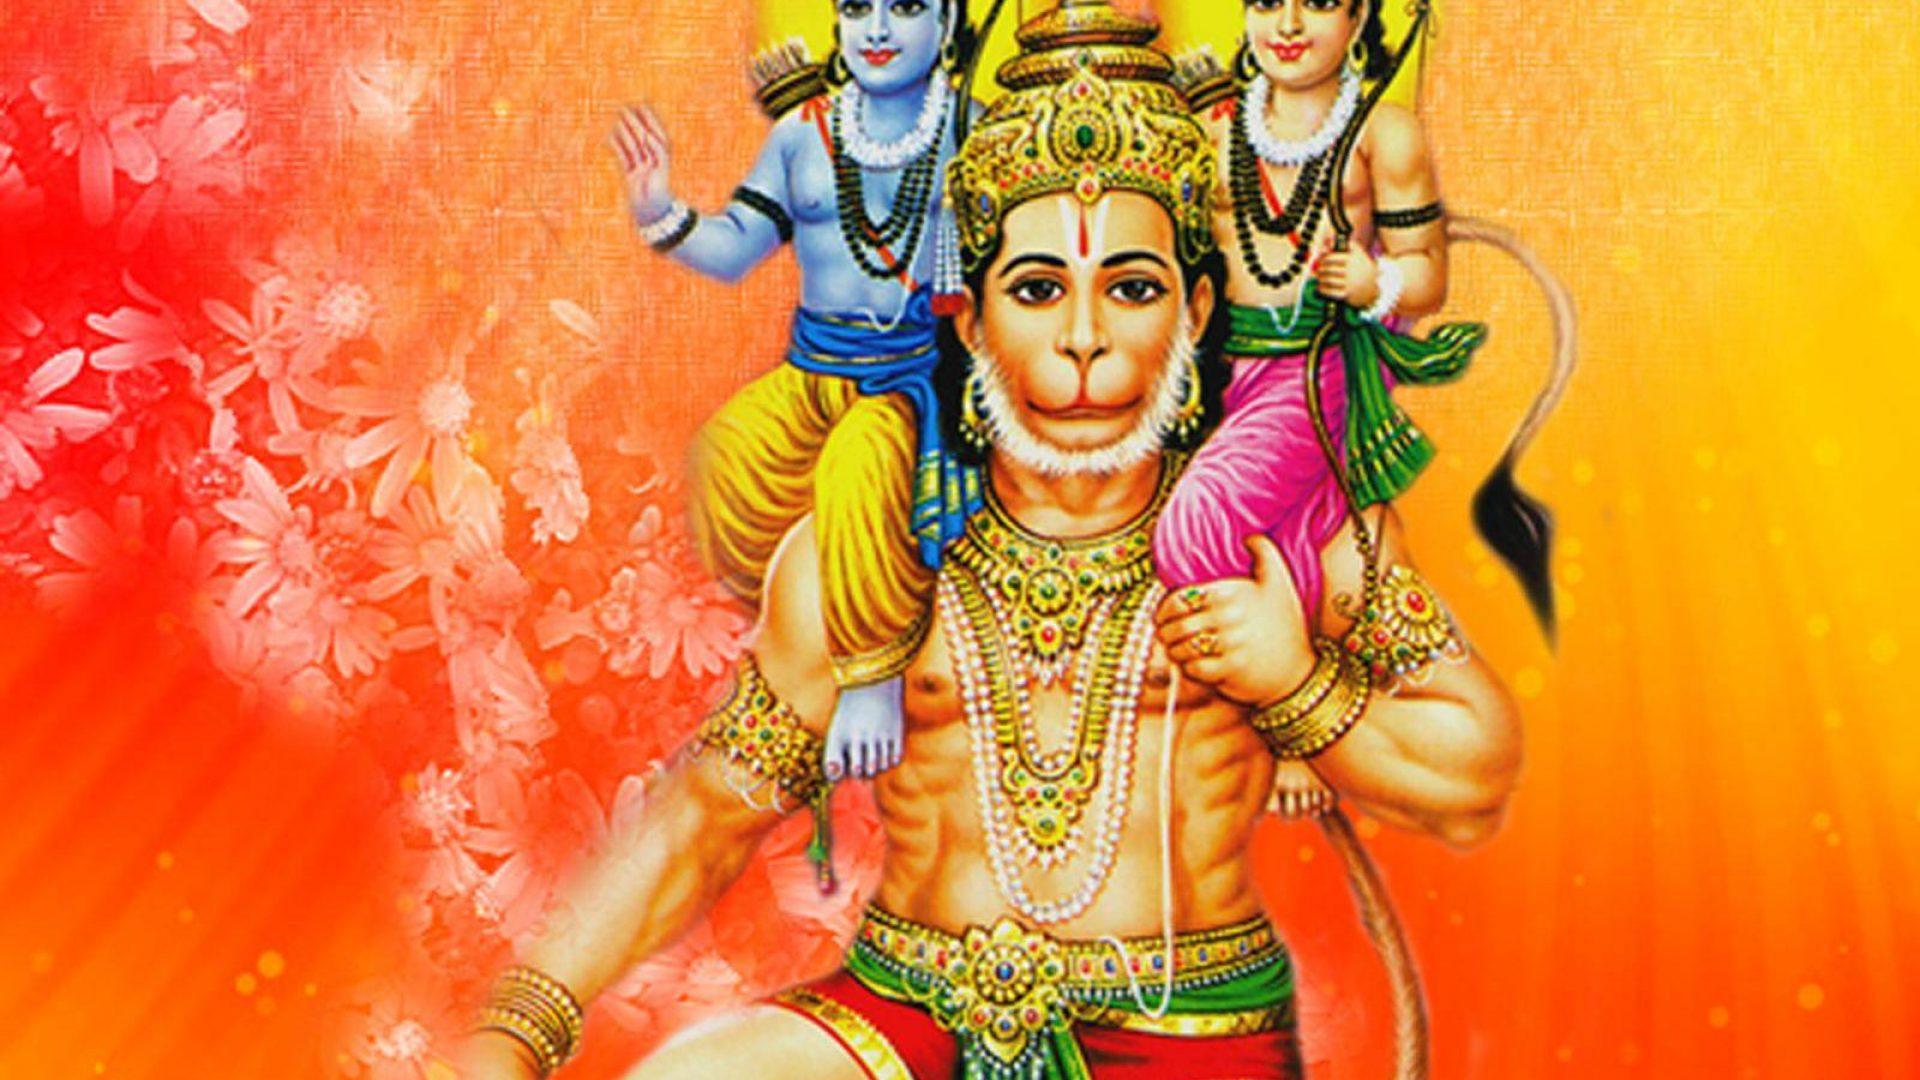 shri ram ji and lord hanuman wallpaper